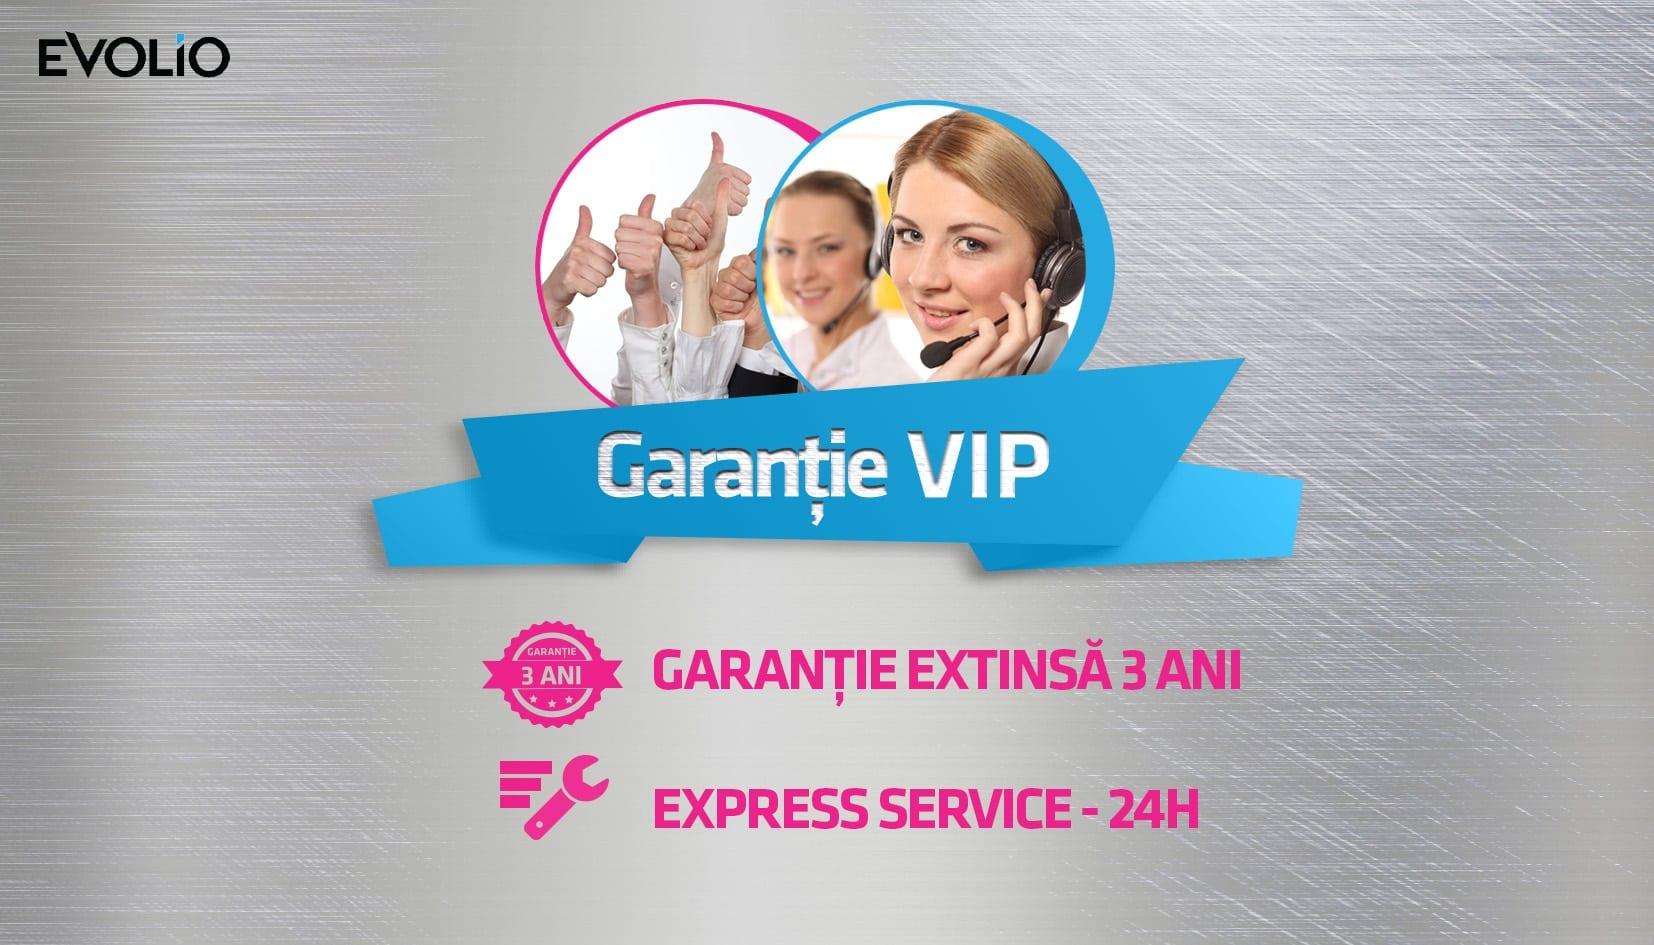 Evolio lansează Garanția VIP